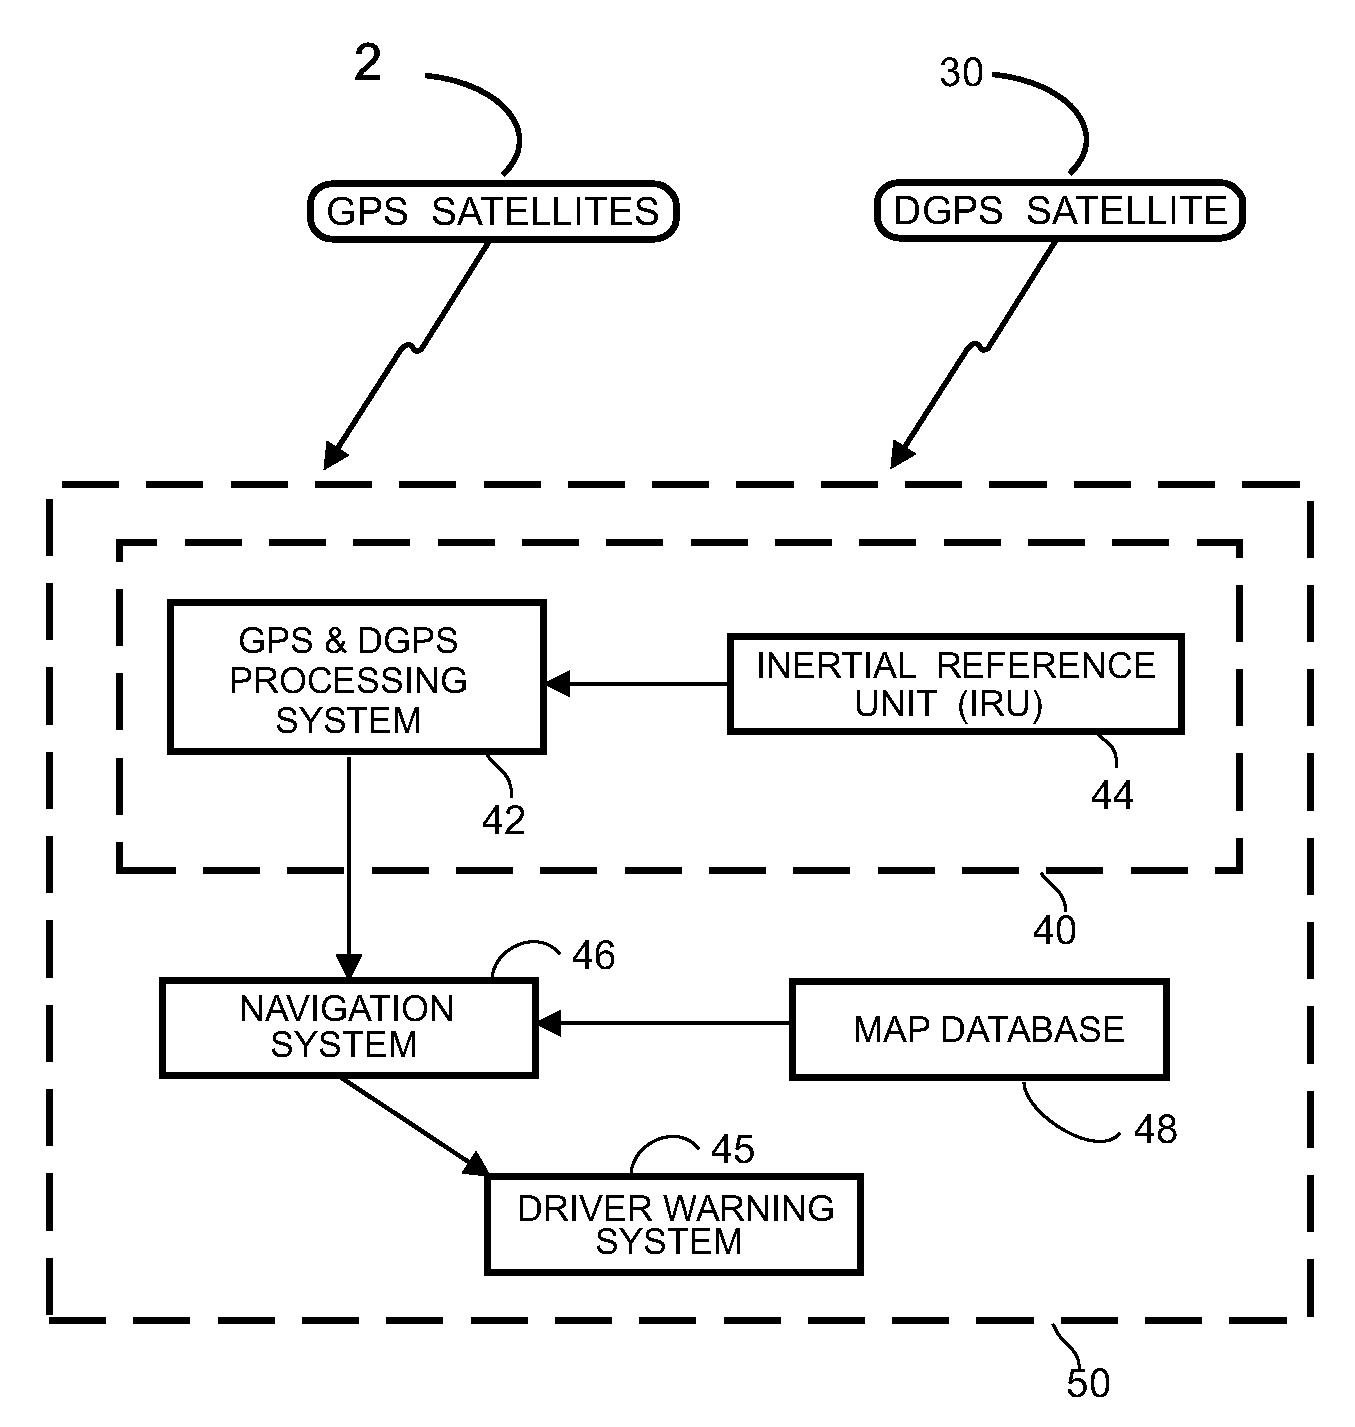 Patent US 8,965,677 B2